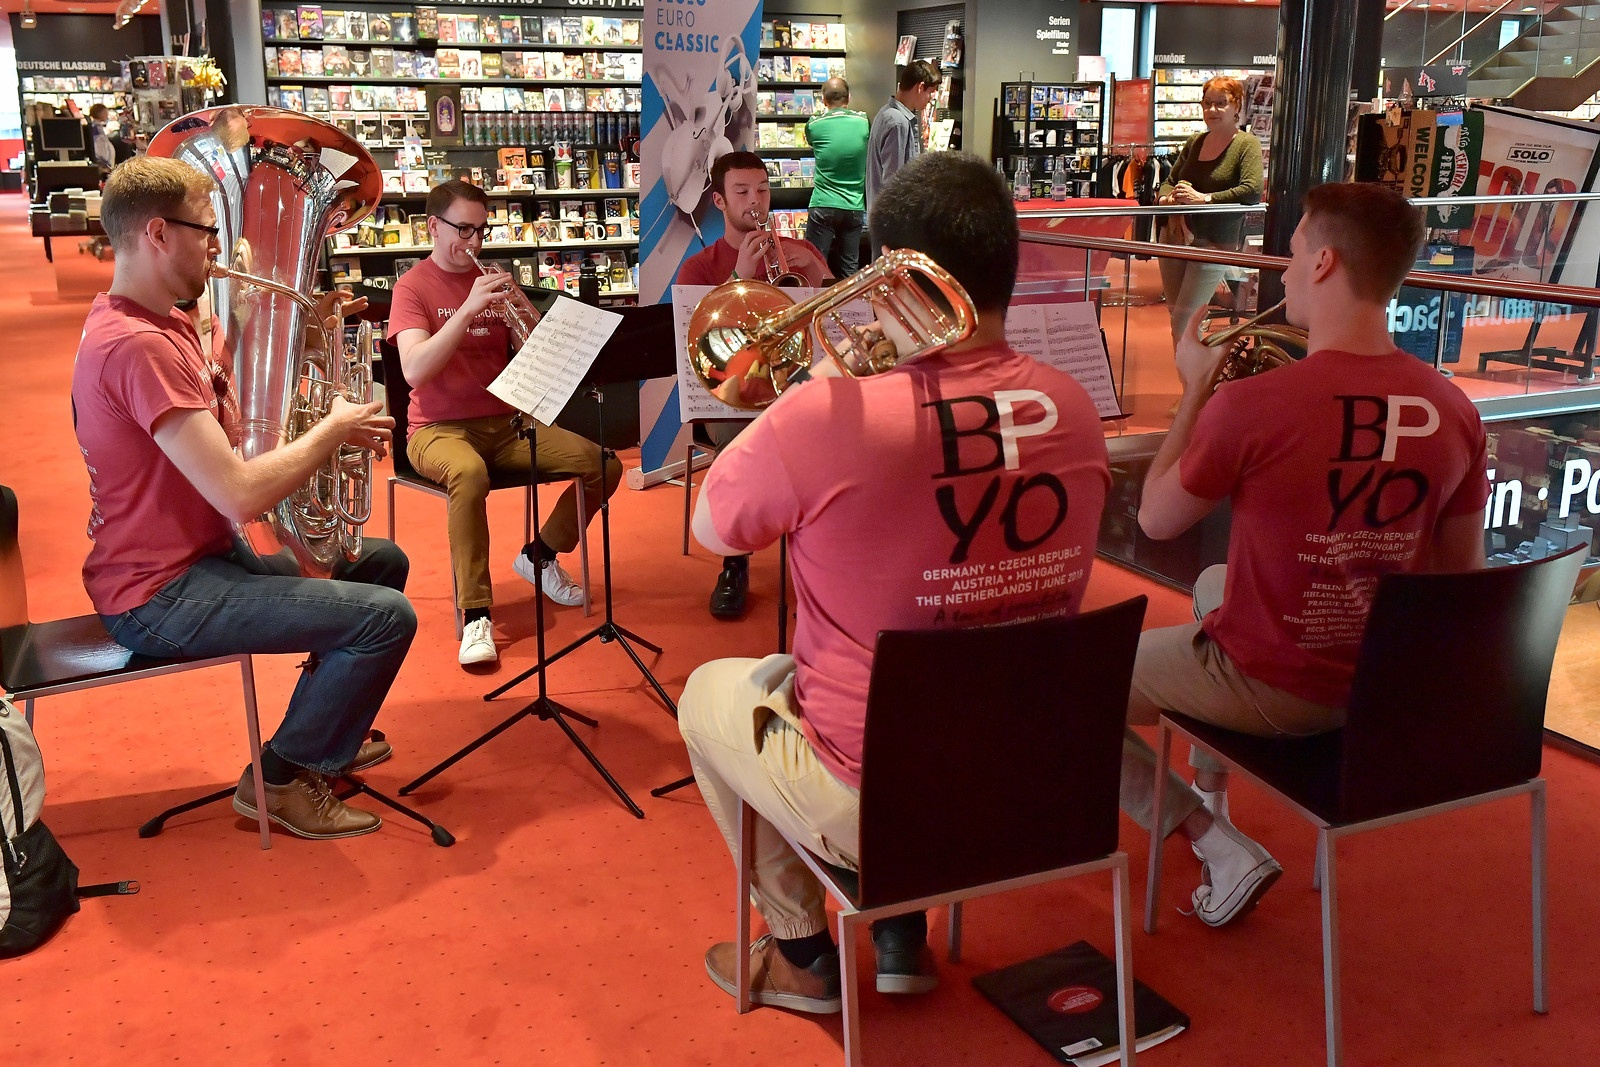 FY18 BPYO Tour - BPYO brass quintet Berlin (credit - Paul Marotta)